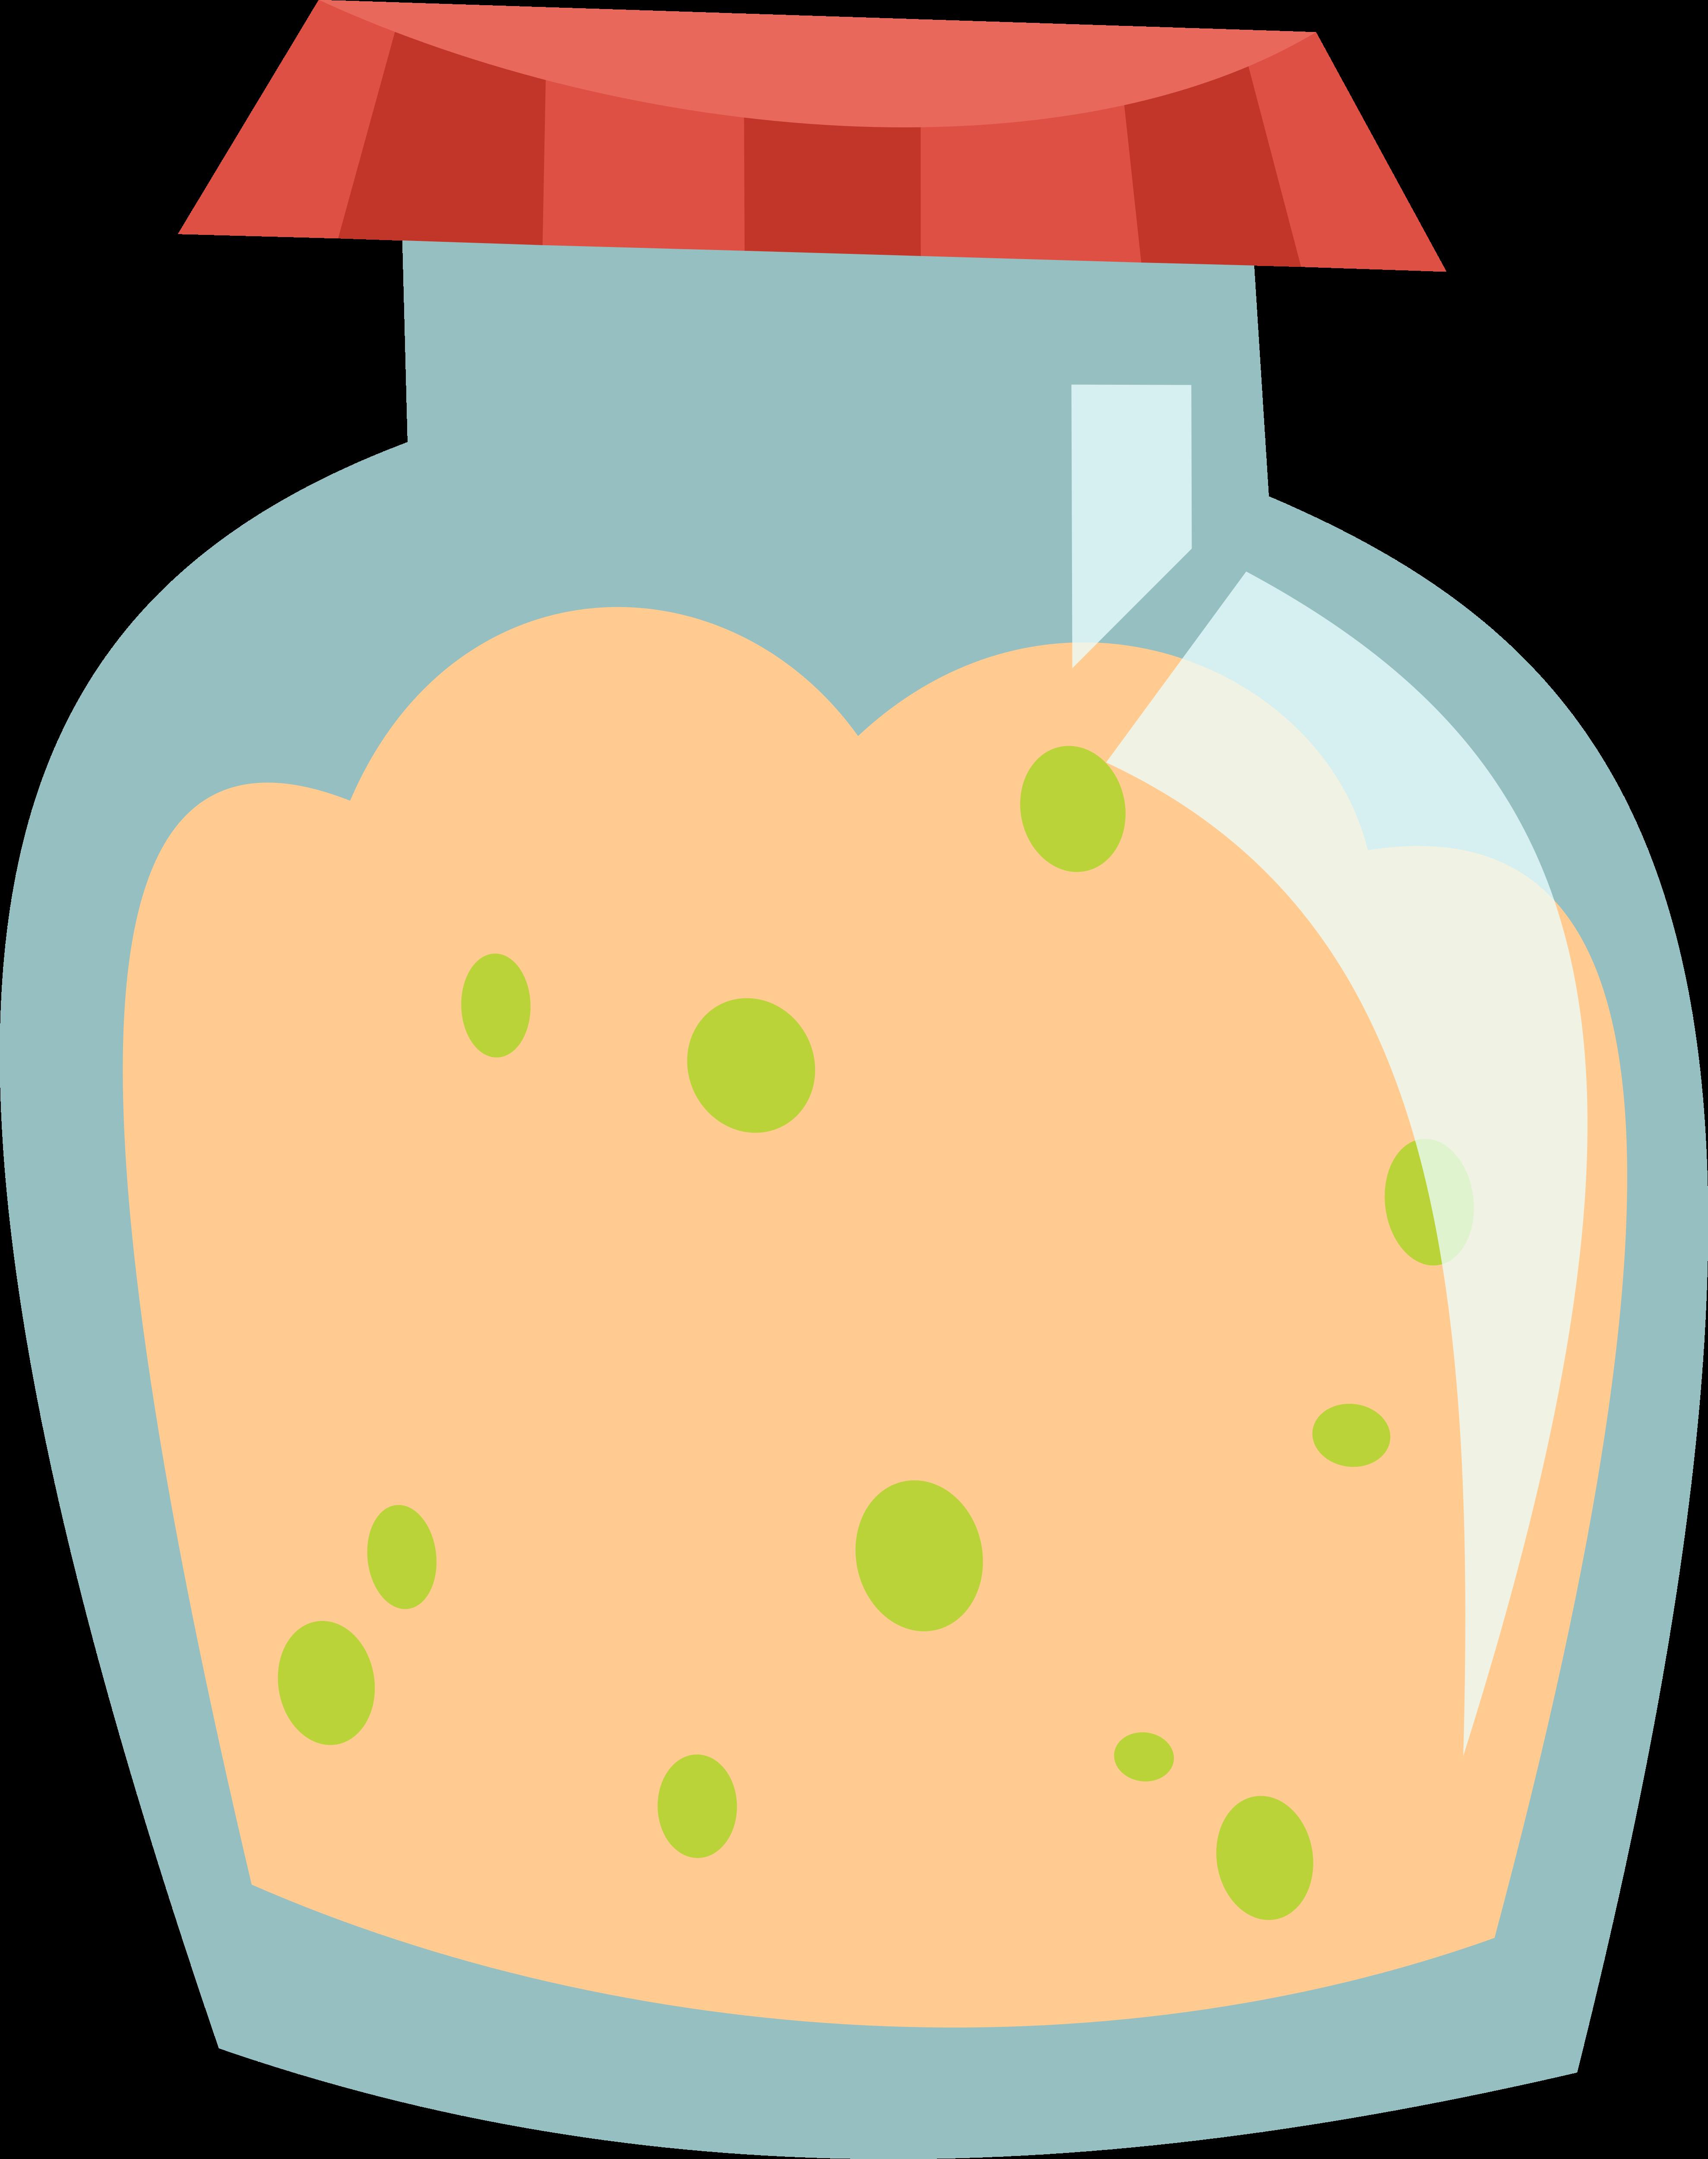 Pear Butter's Cutie Mark